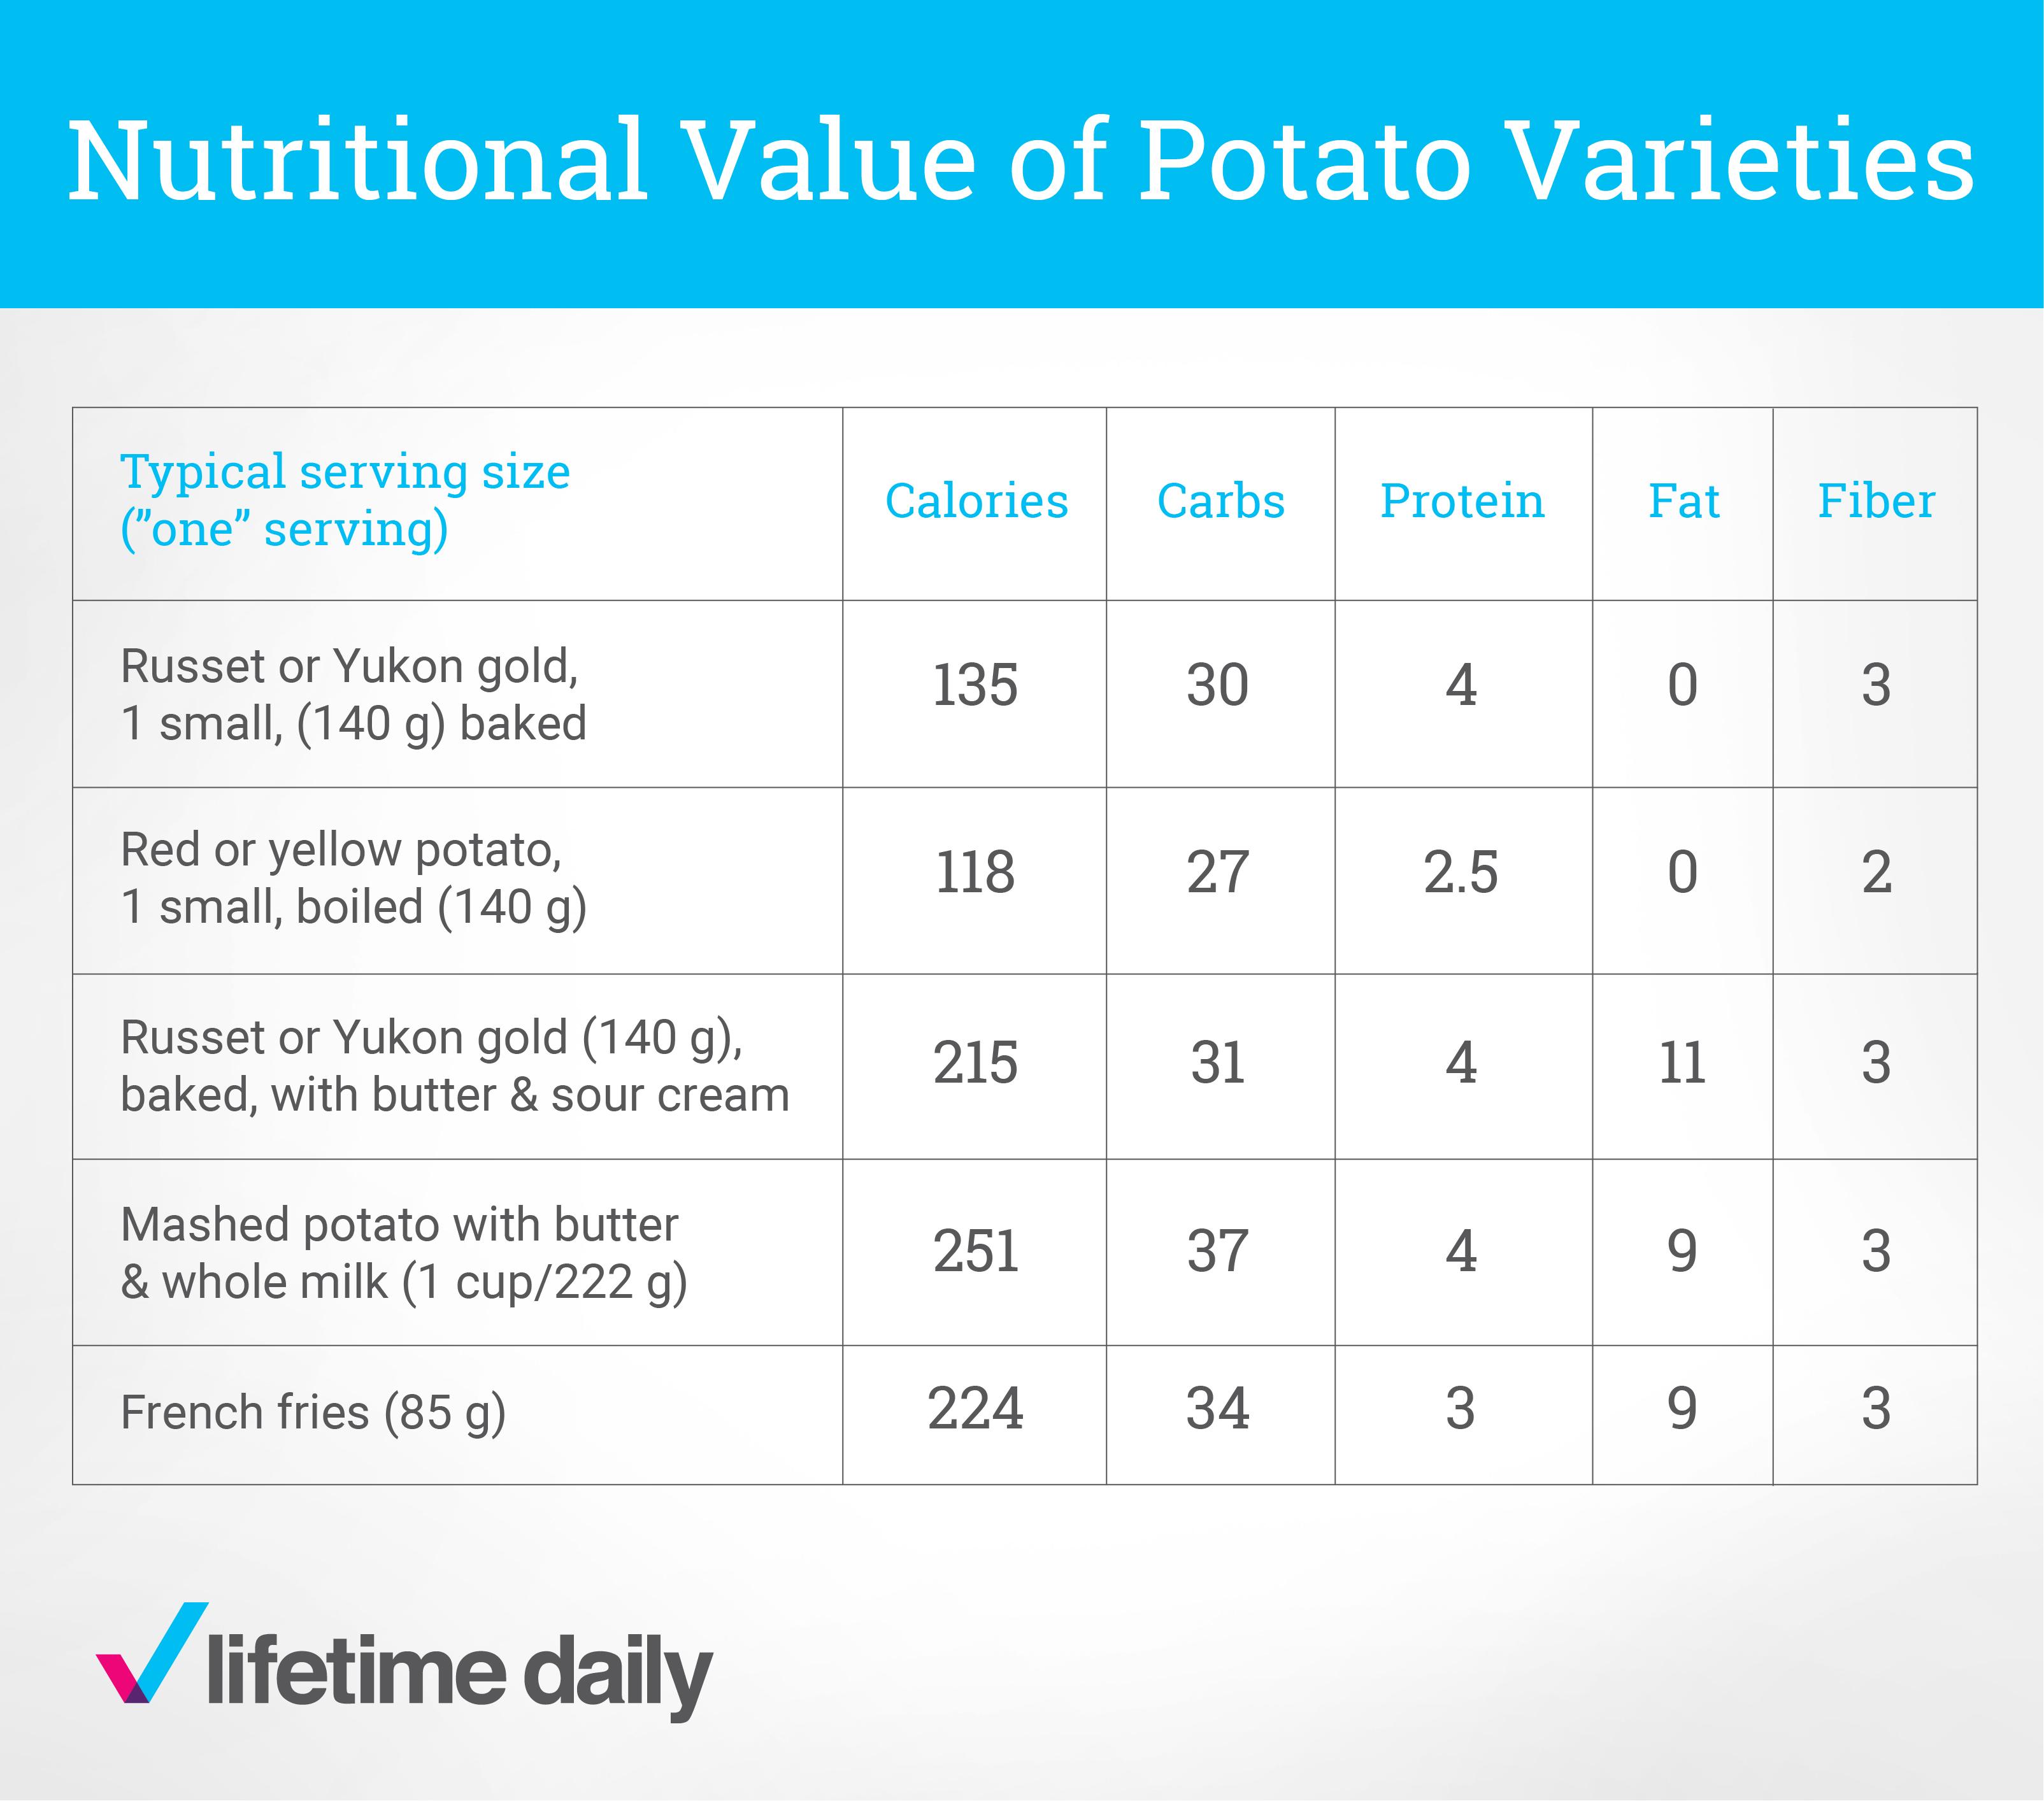 Nutritional-Value-of-Potato-Varities